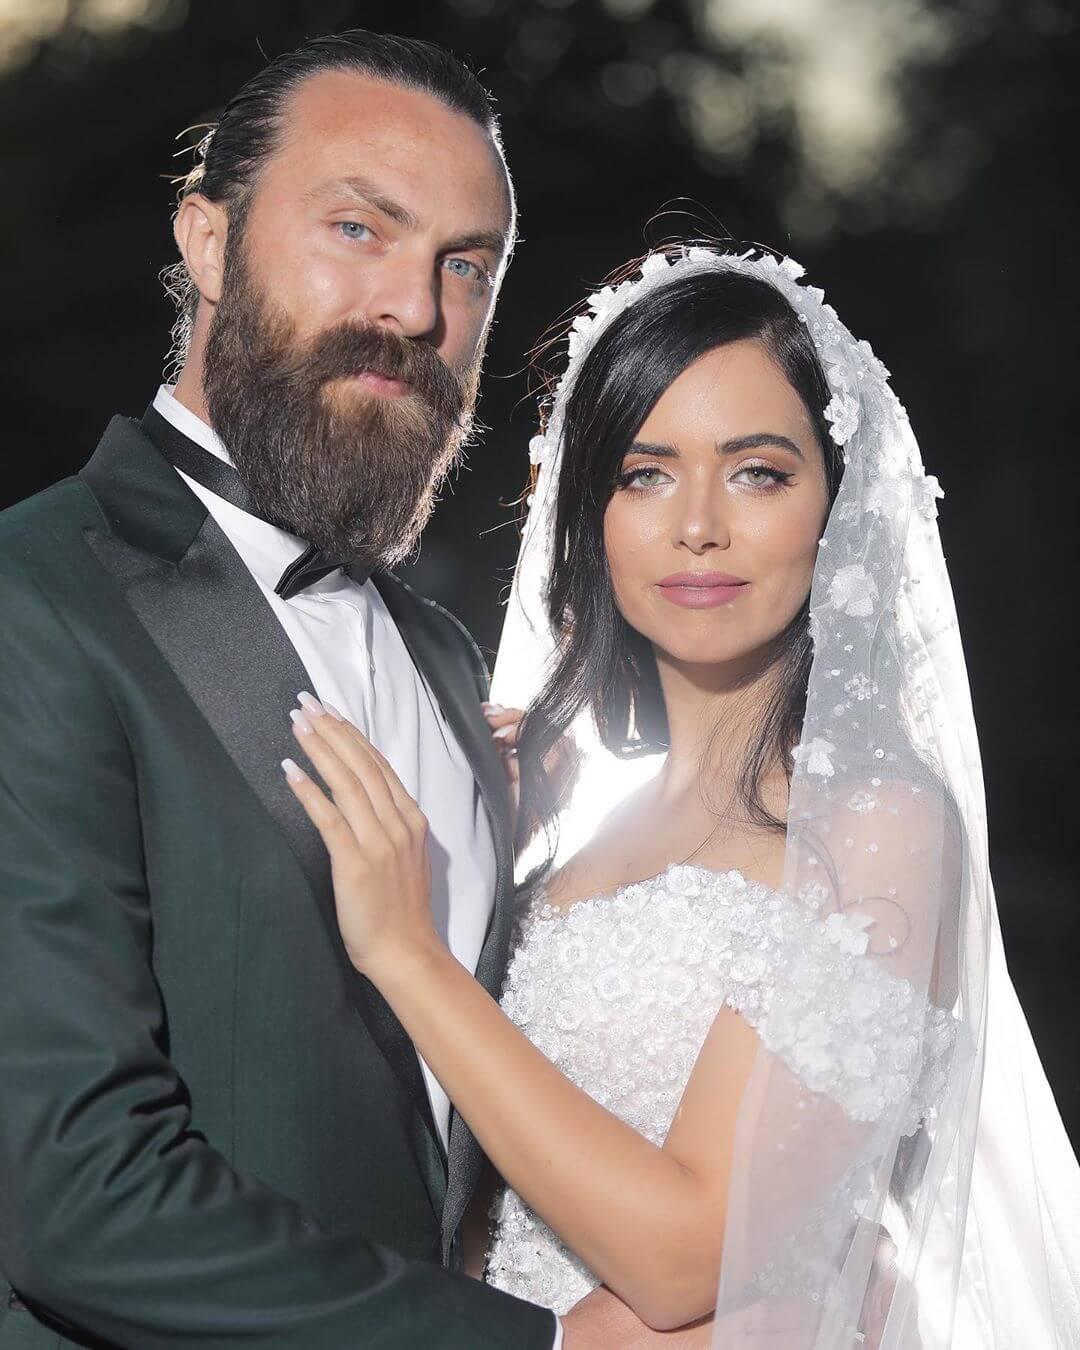 Azza Zarour husband